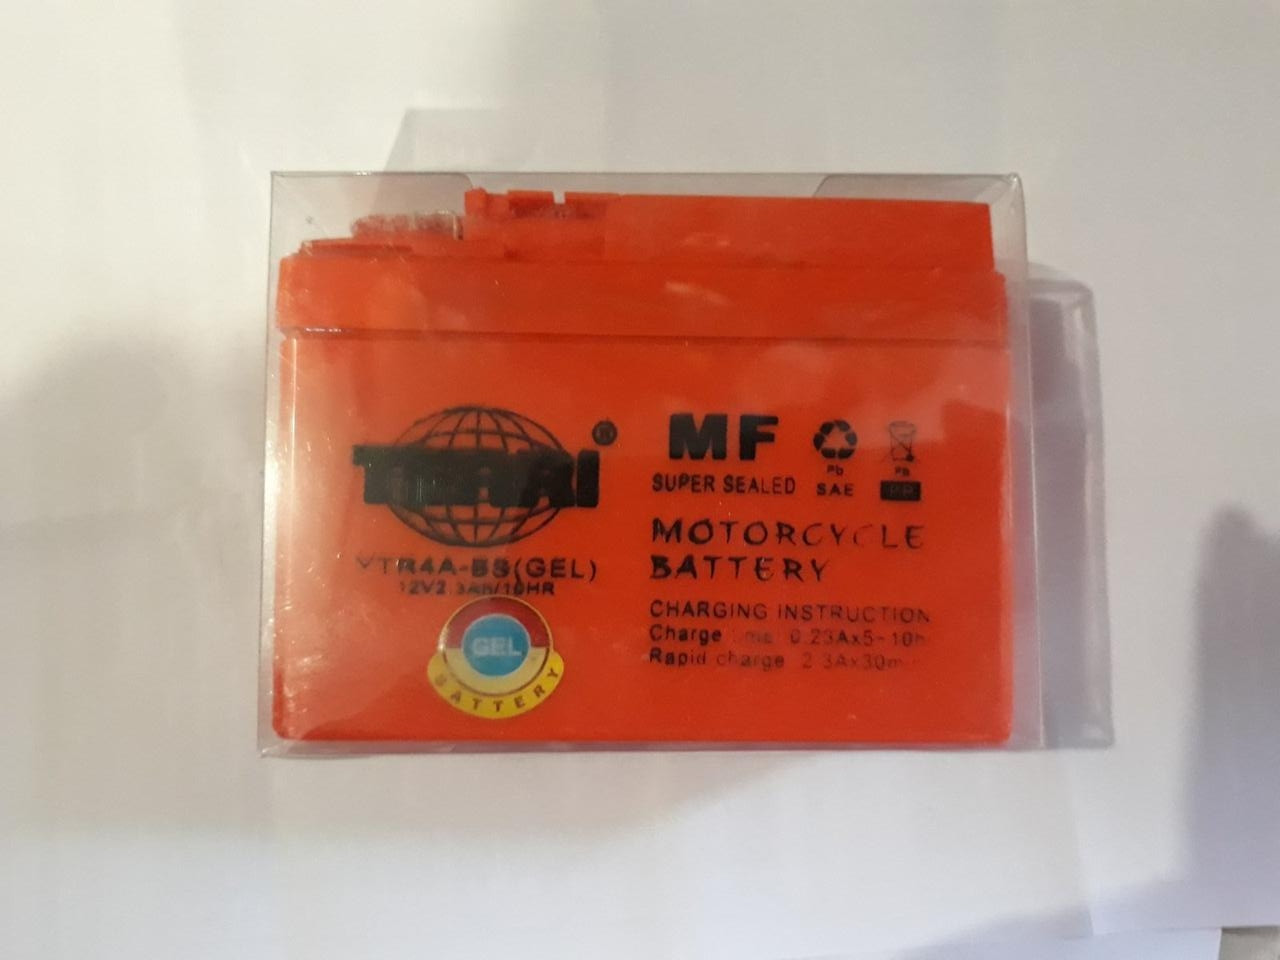 Акумулятор 12V 2/3 A 113-49-85 мм для скутера Honda Dio AF 18 (гелевий)